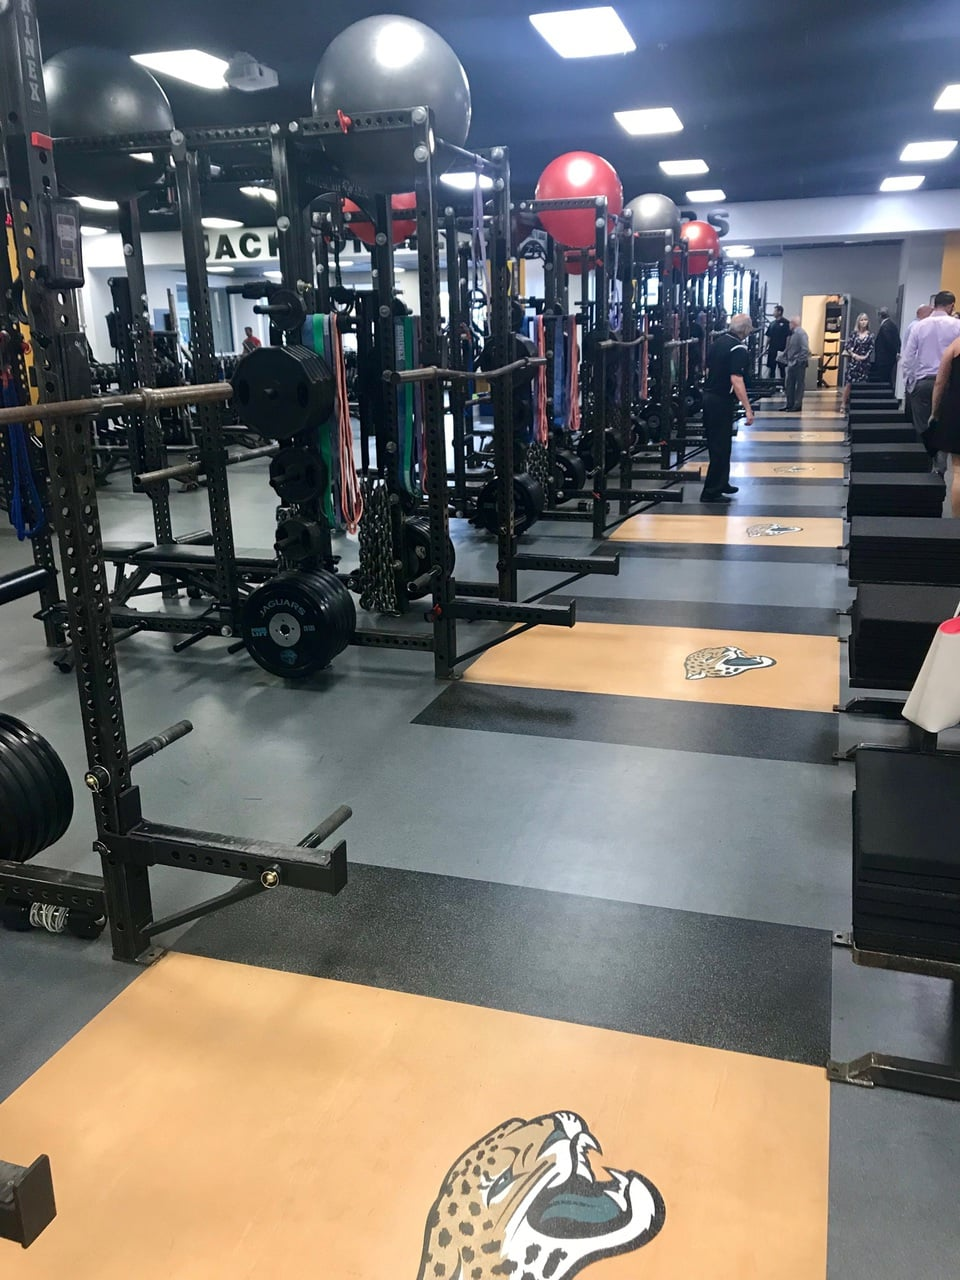 jacksonville jaguars gym